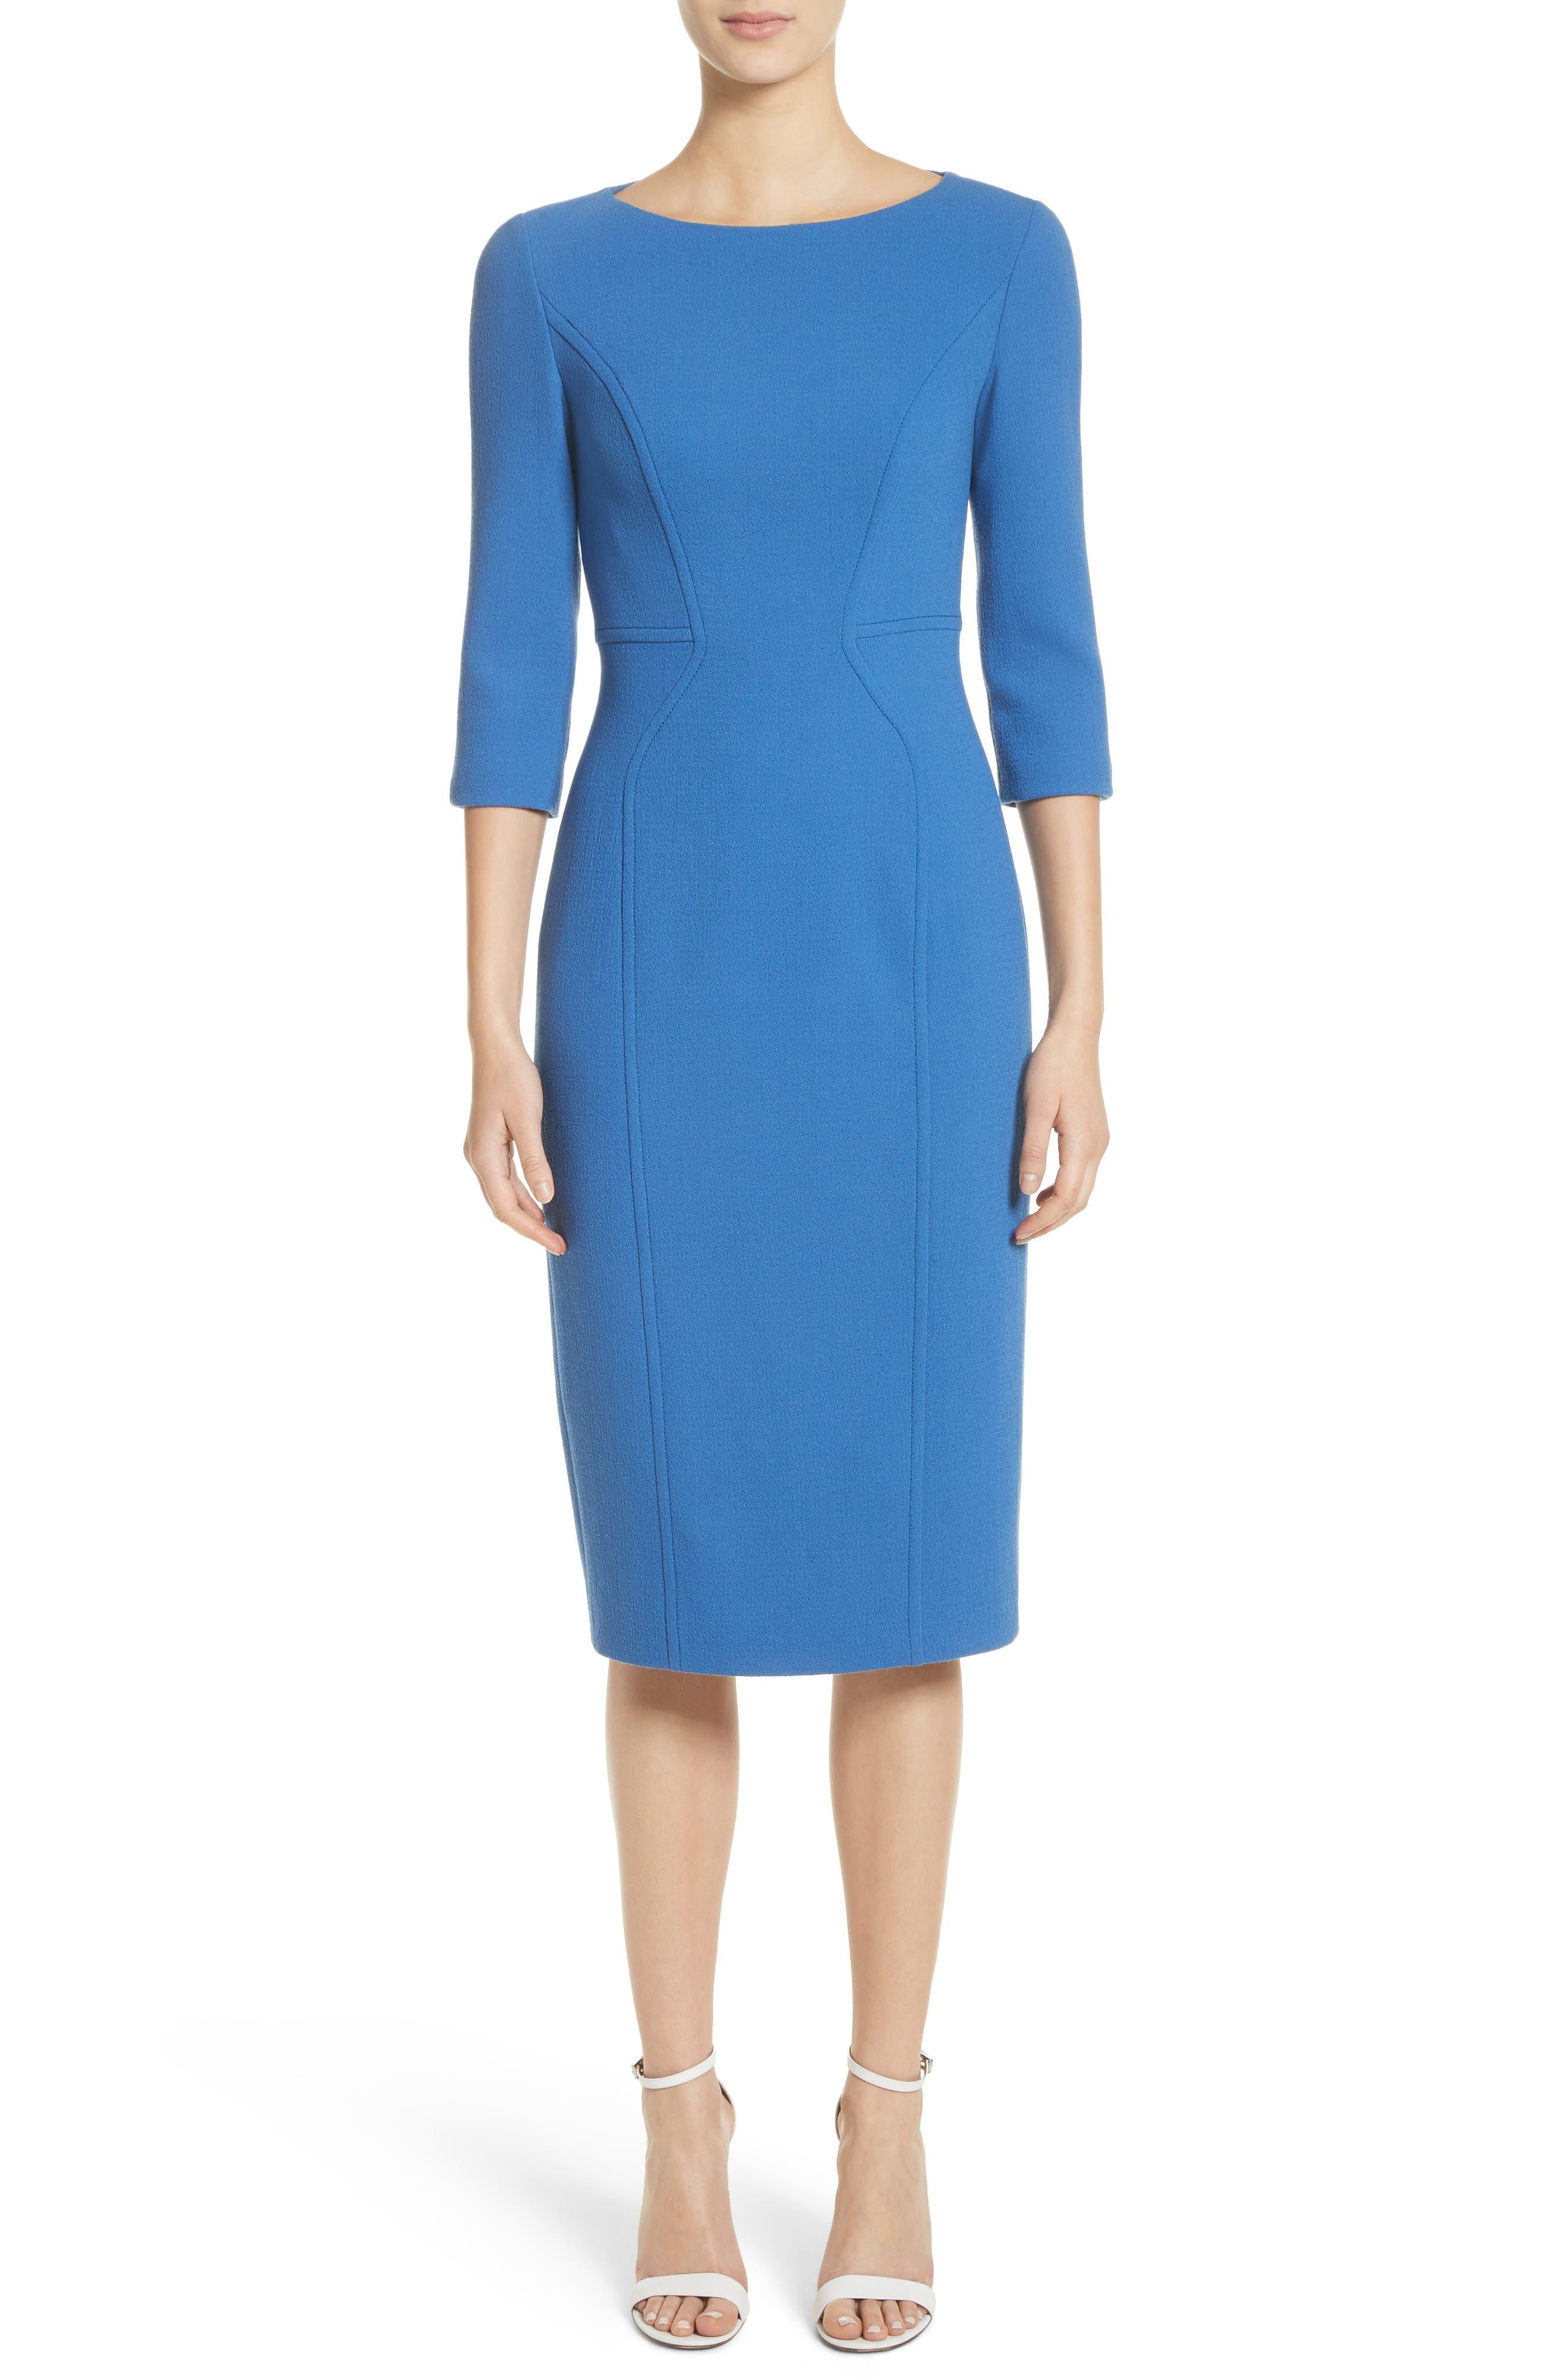 Michael Kors Stretch Wool Sheath Dress